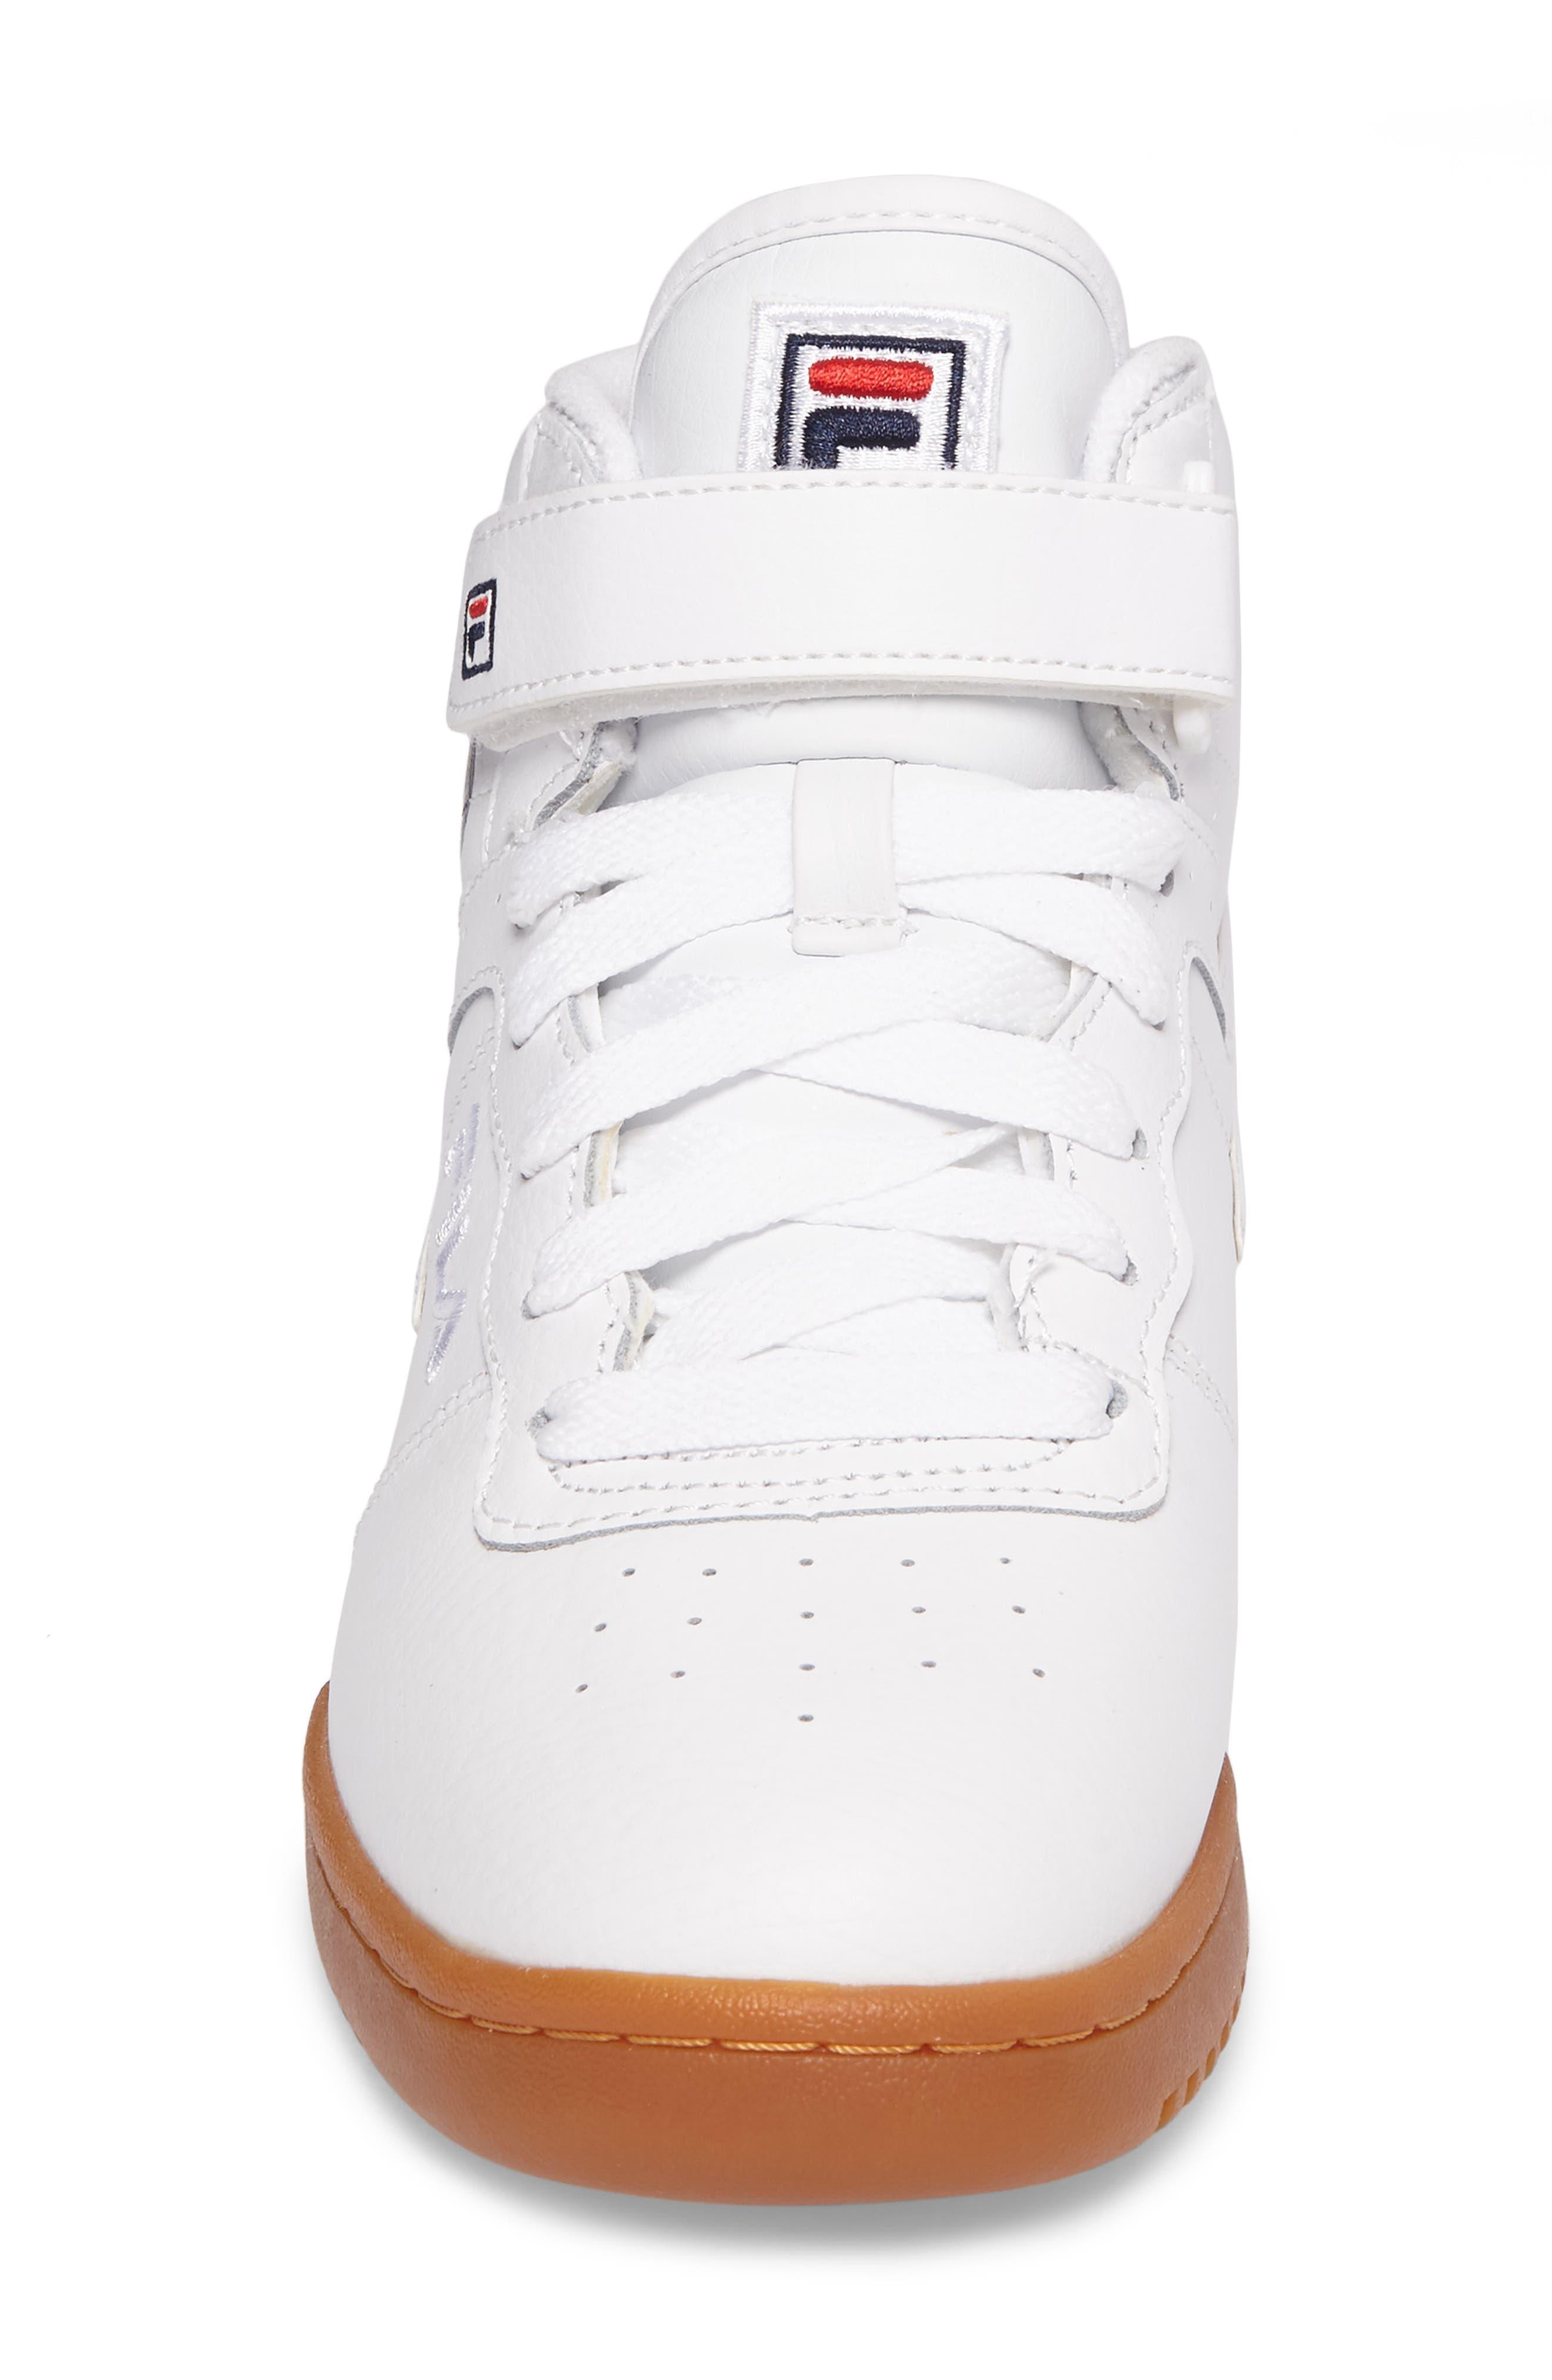 Original Fitness Logo Mid Top Sneaker,                             Alternate thumbnail 4, color,                             White/ Navy/ Red